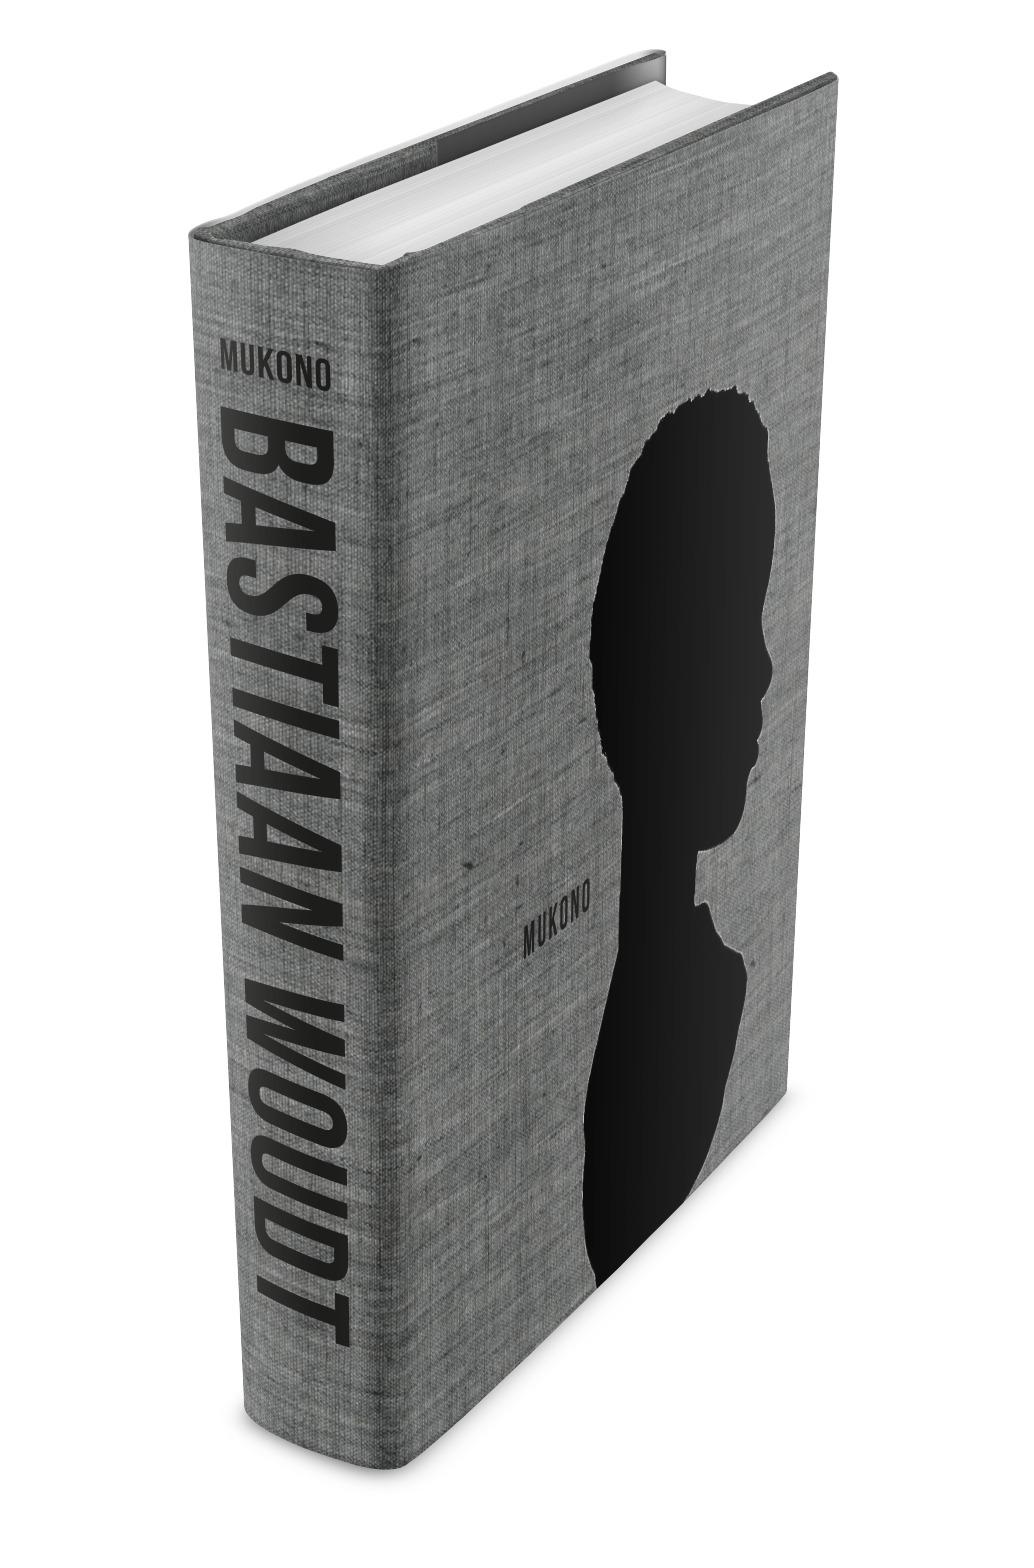 Congratulations winning book! e - bastiaanwoudt | ello